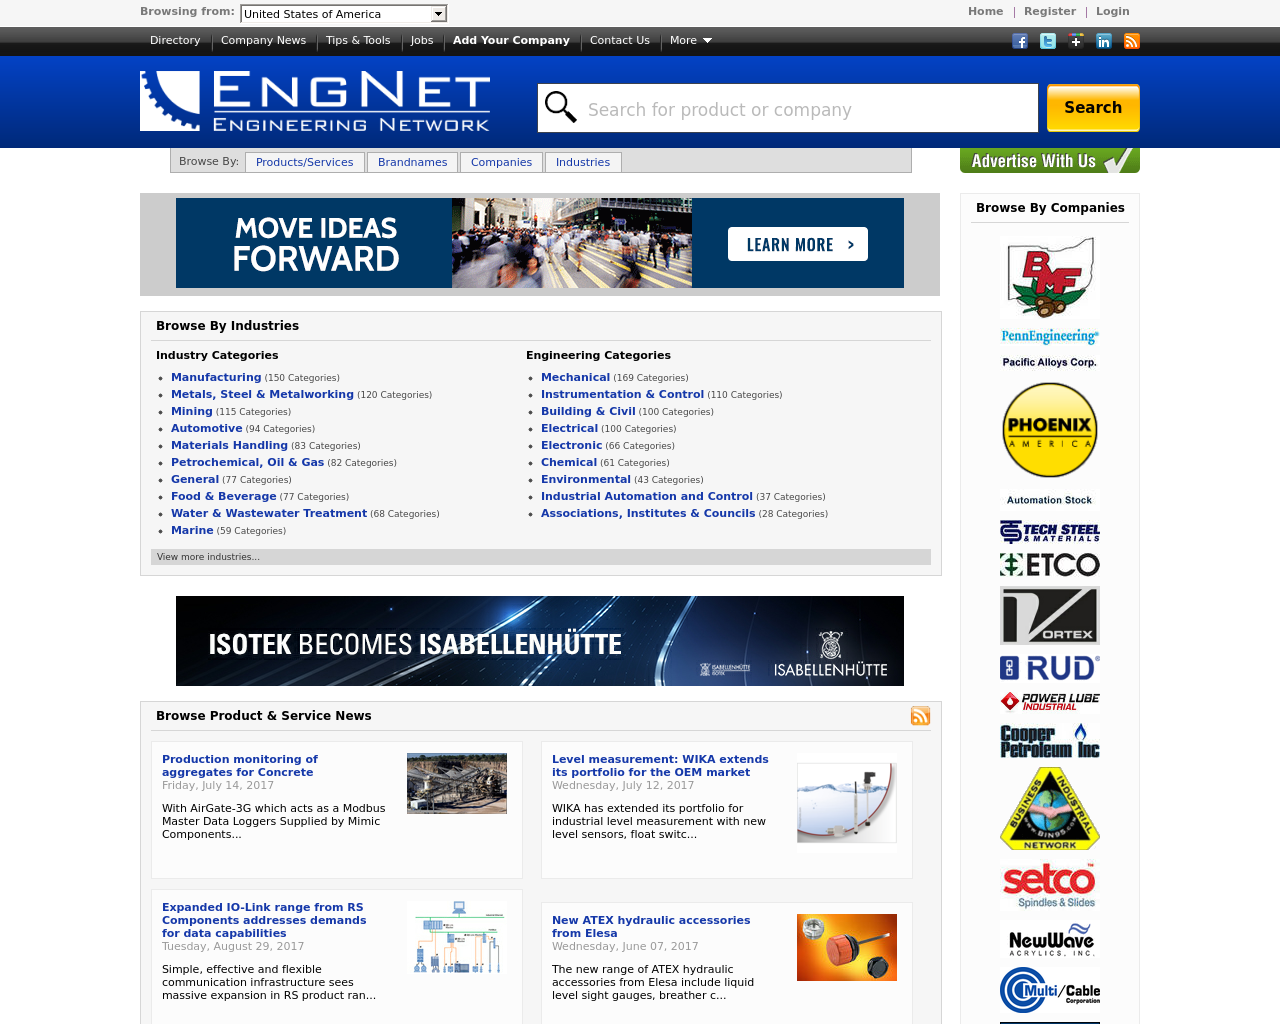 EngNet-Advertising-Reviews-Pricing